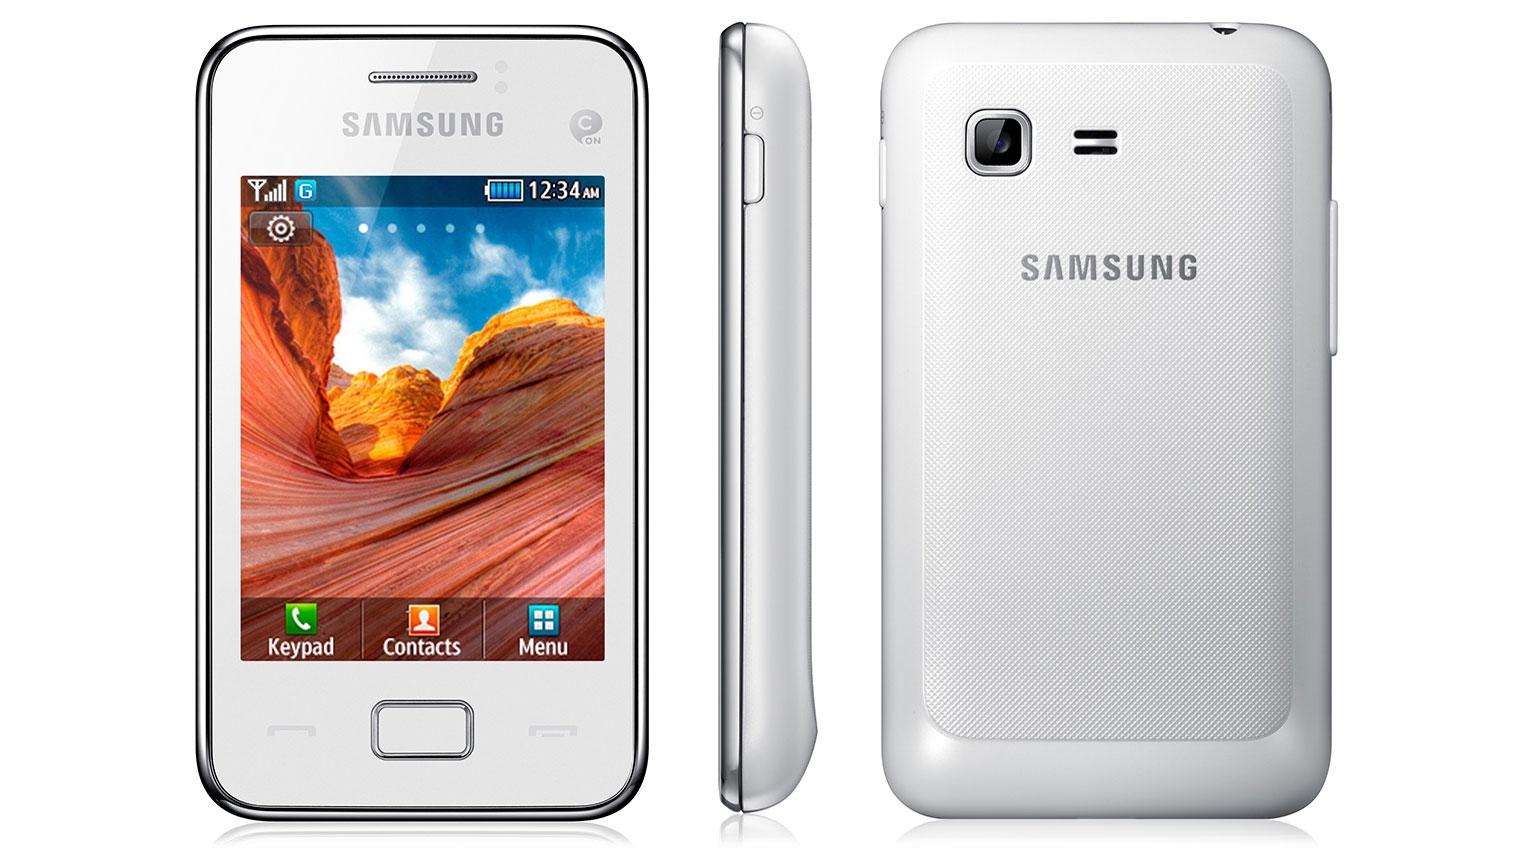 Samsung tocco lite 3g settings